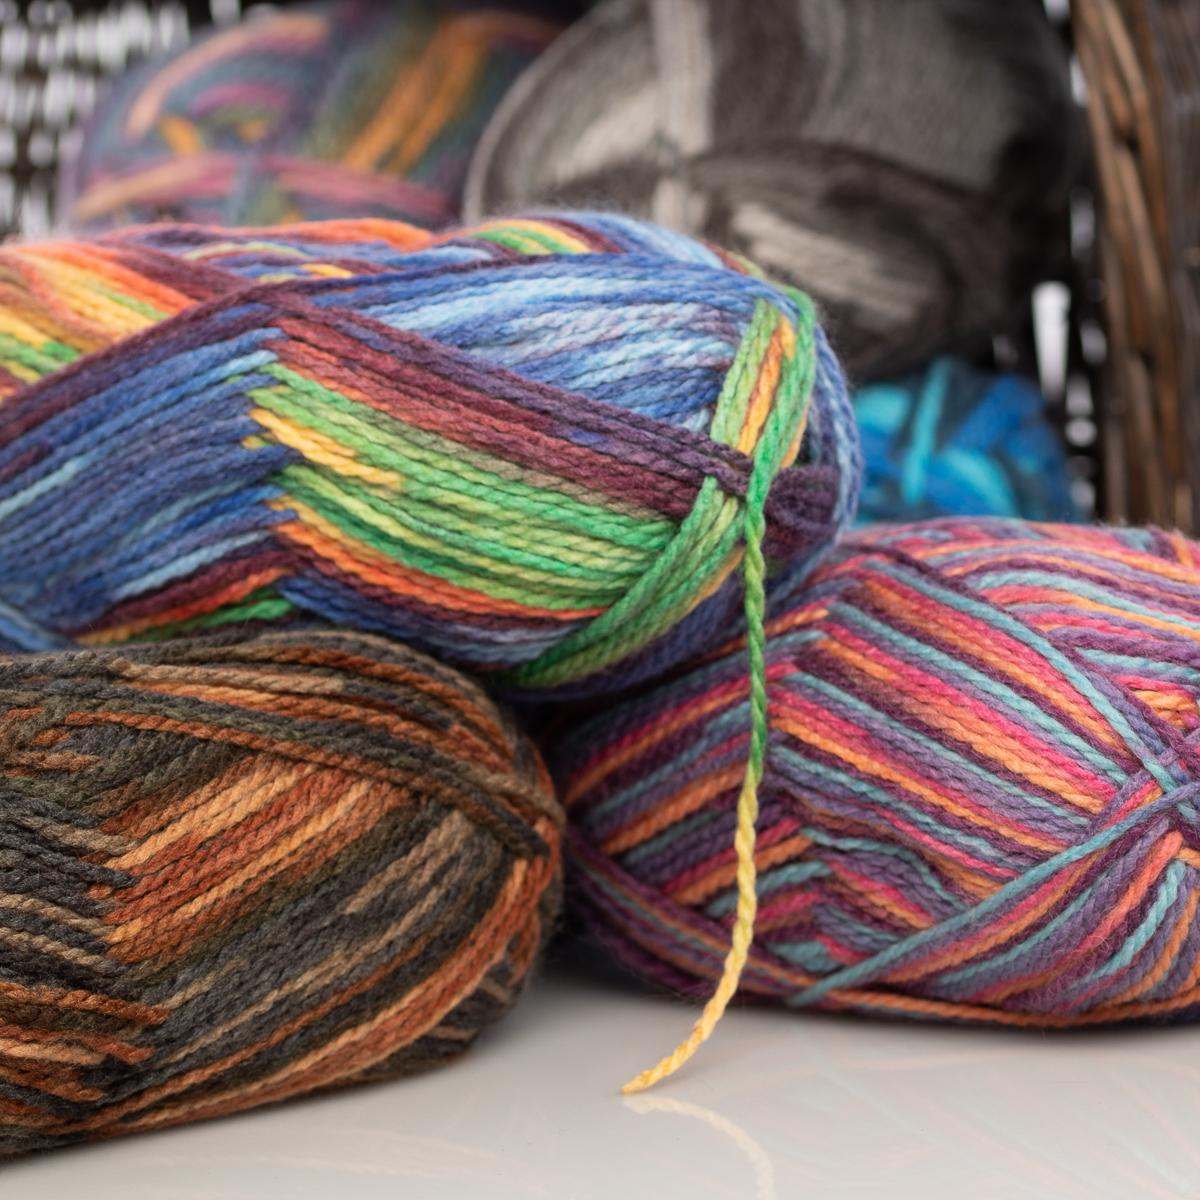 3pk-Lion-Brand-Color-Waves-Acrylic-amp-Wool-Yarn-Light-3-Soft-Knitting-Crocheting thumbnail 34